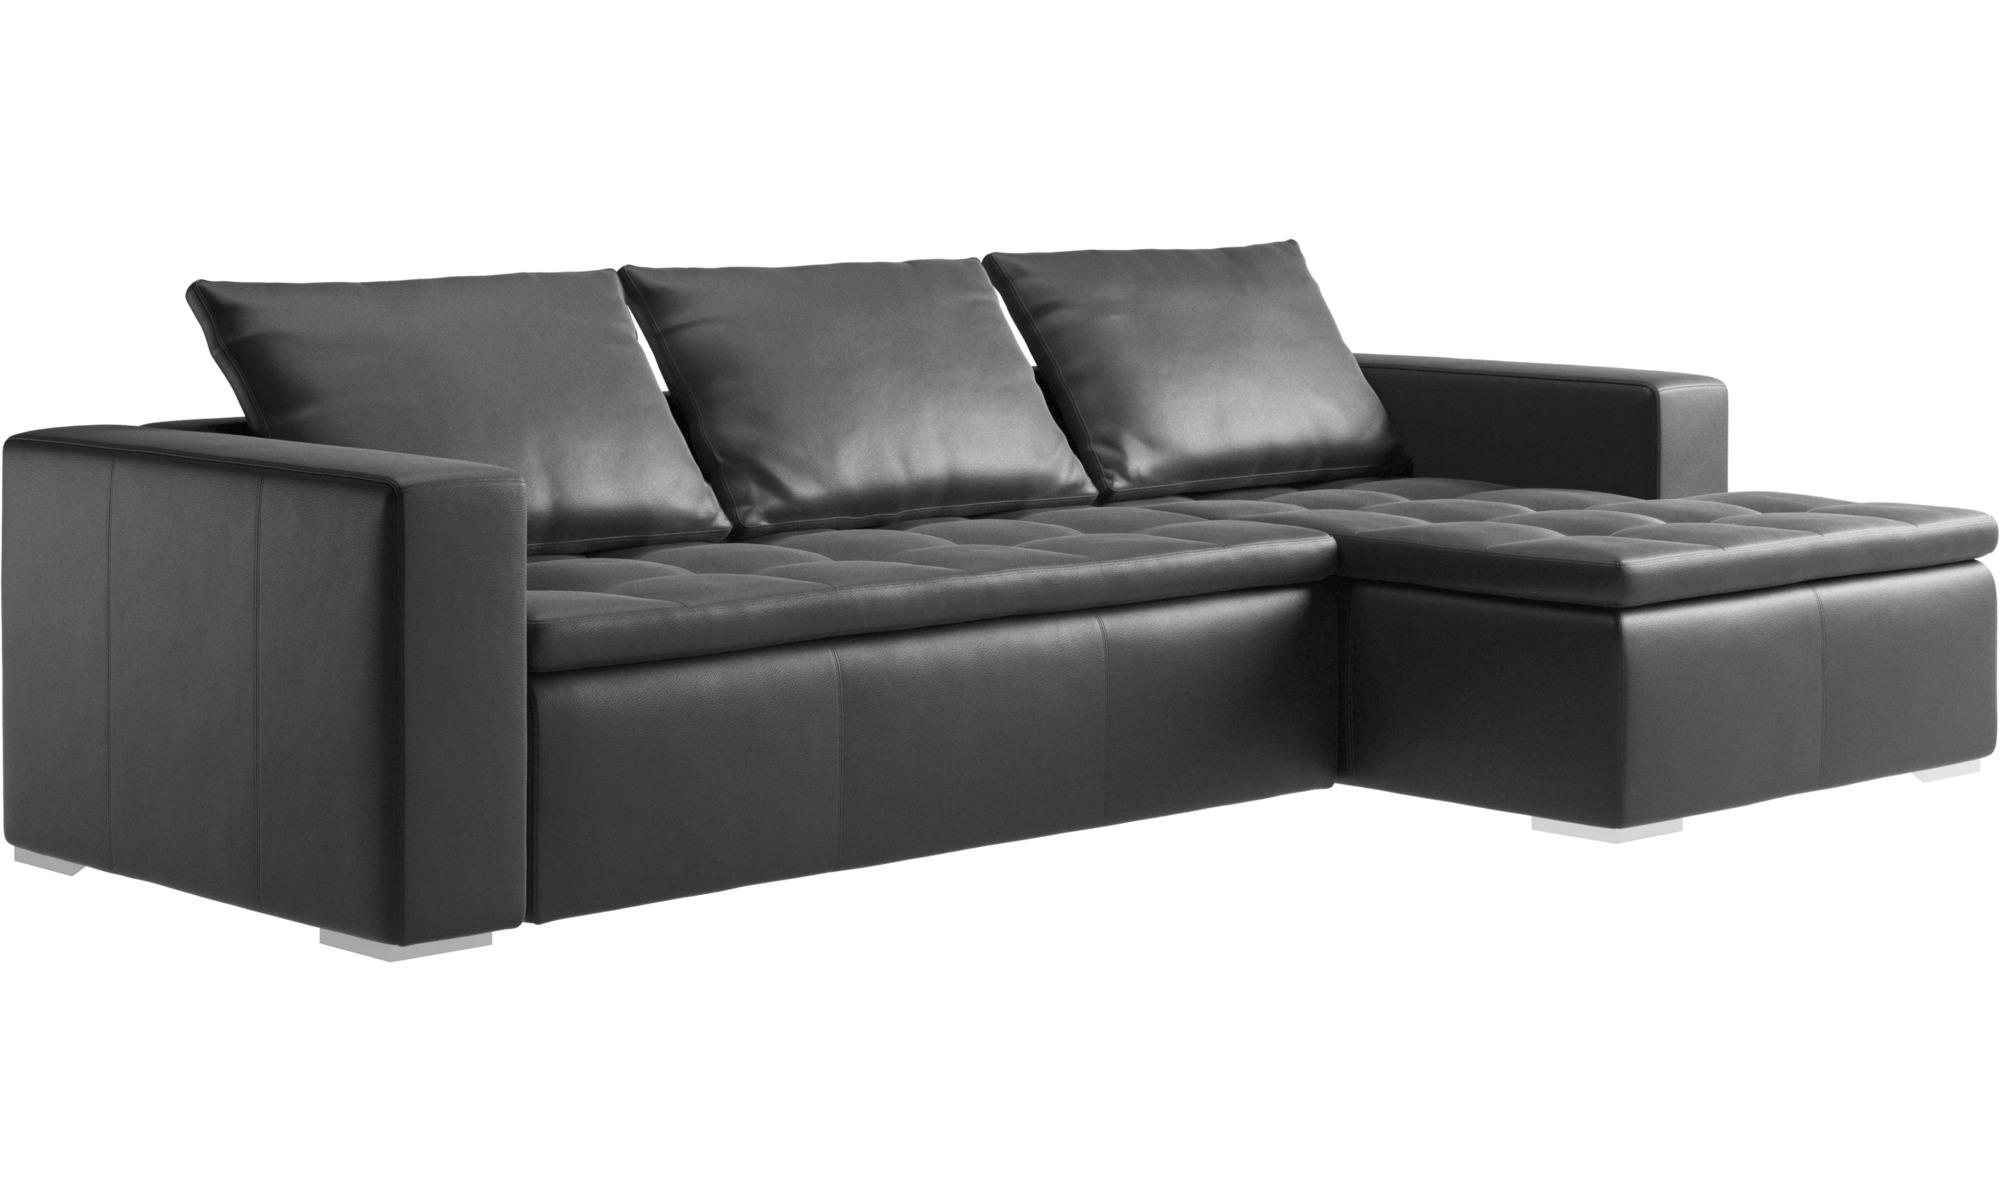 chaise longue sofas mezzo sofa with resting unit boconcept. Black Bedroom Furniture Sets. Home Design Ideas